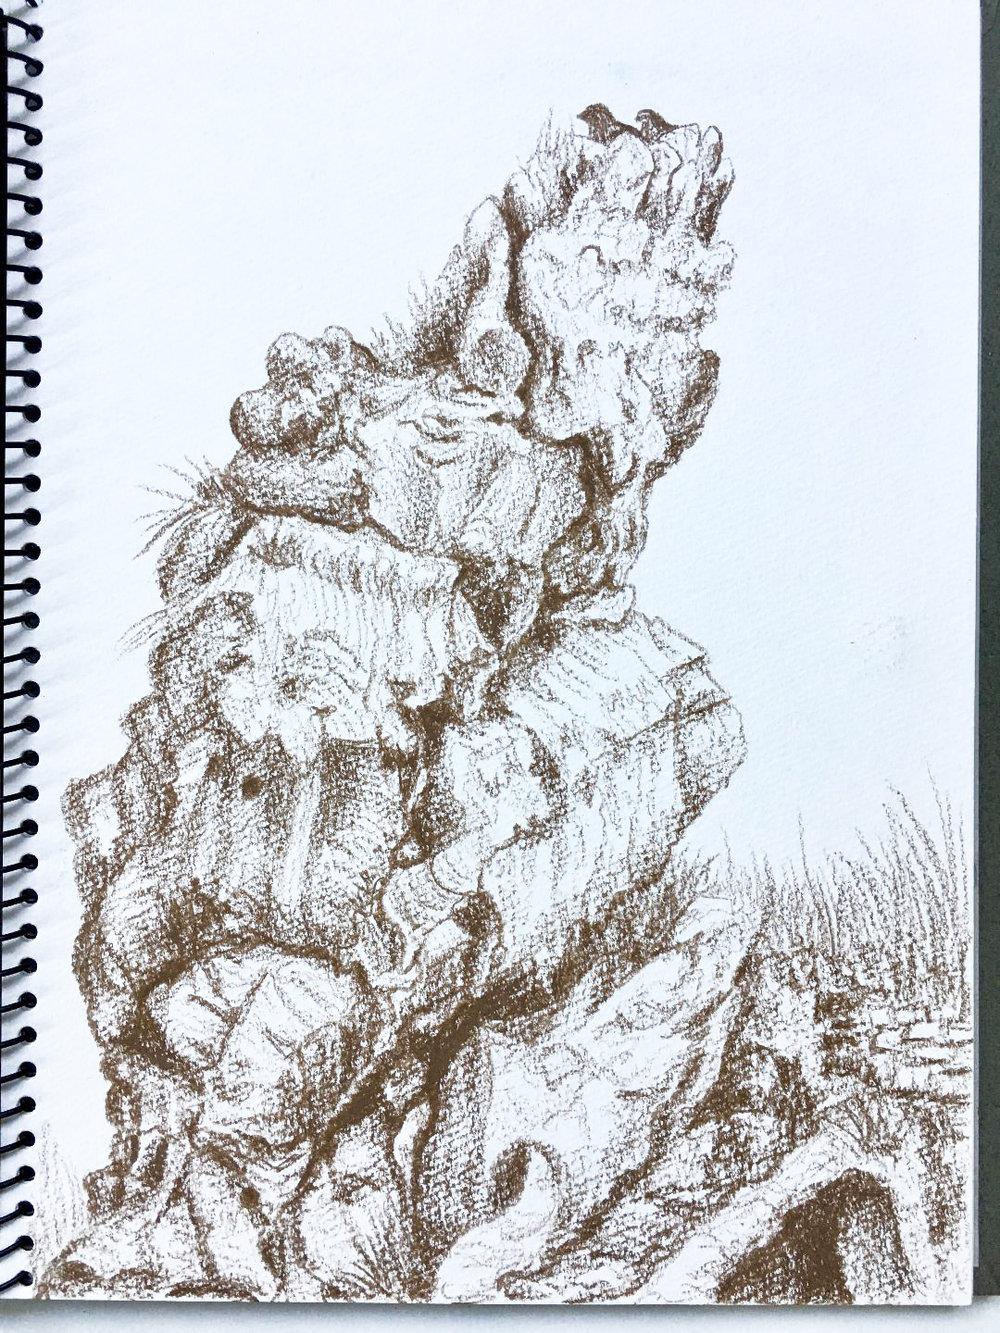 Along the Gravinia ravine face, near a Rock Church, Matera, Basilicata - Limestone Rocks 10.8.2012. Prismacolor. J. Cook artist